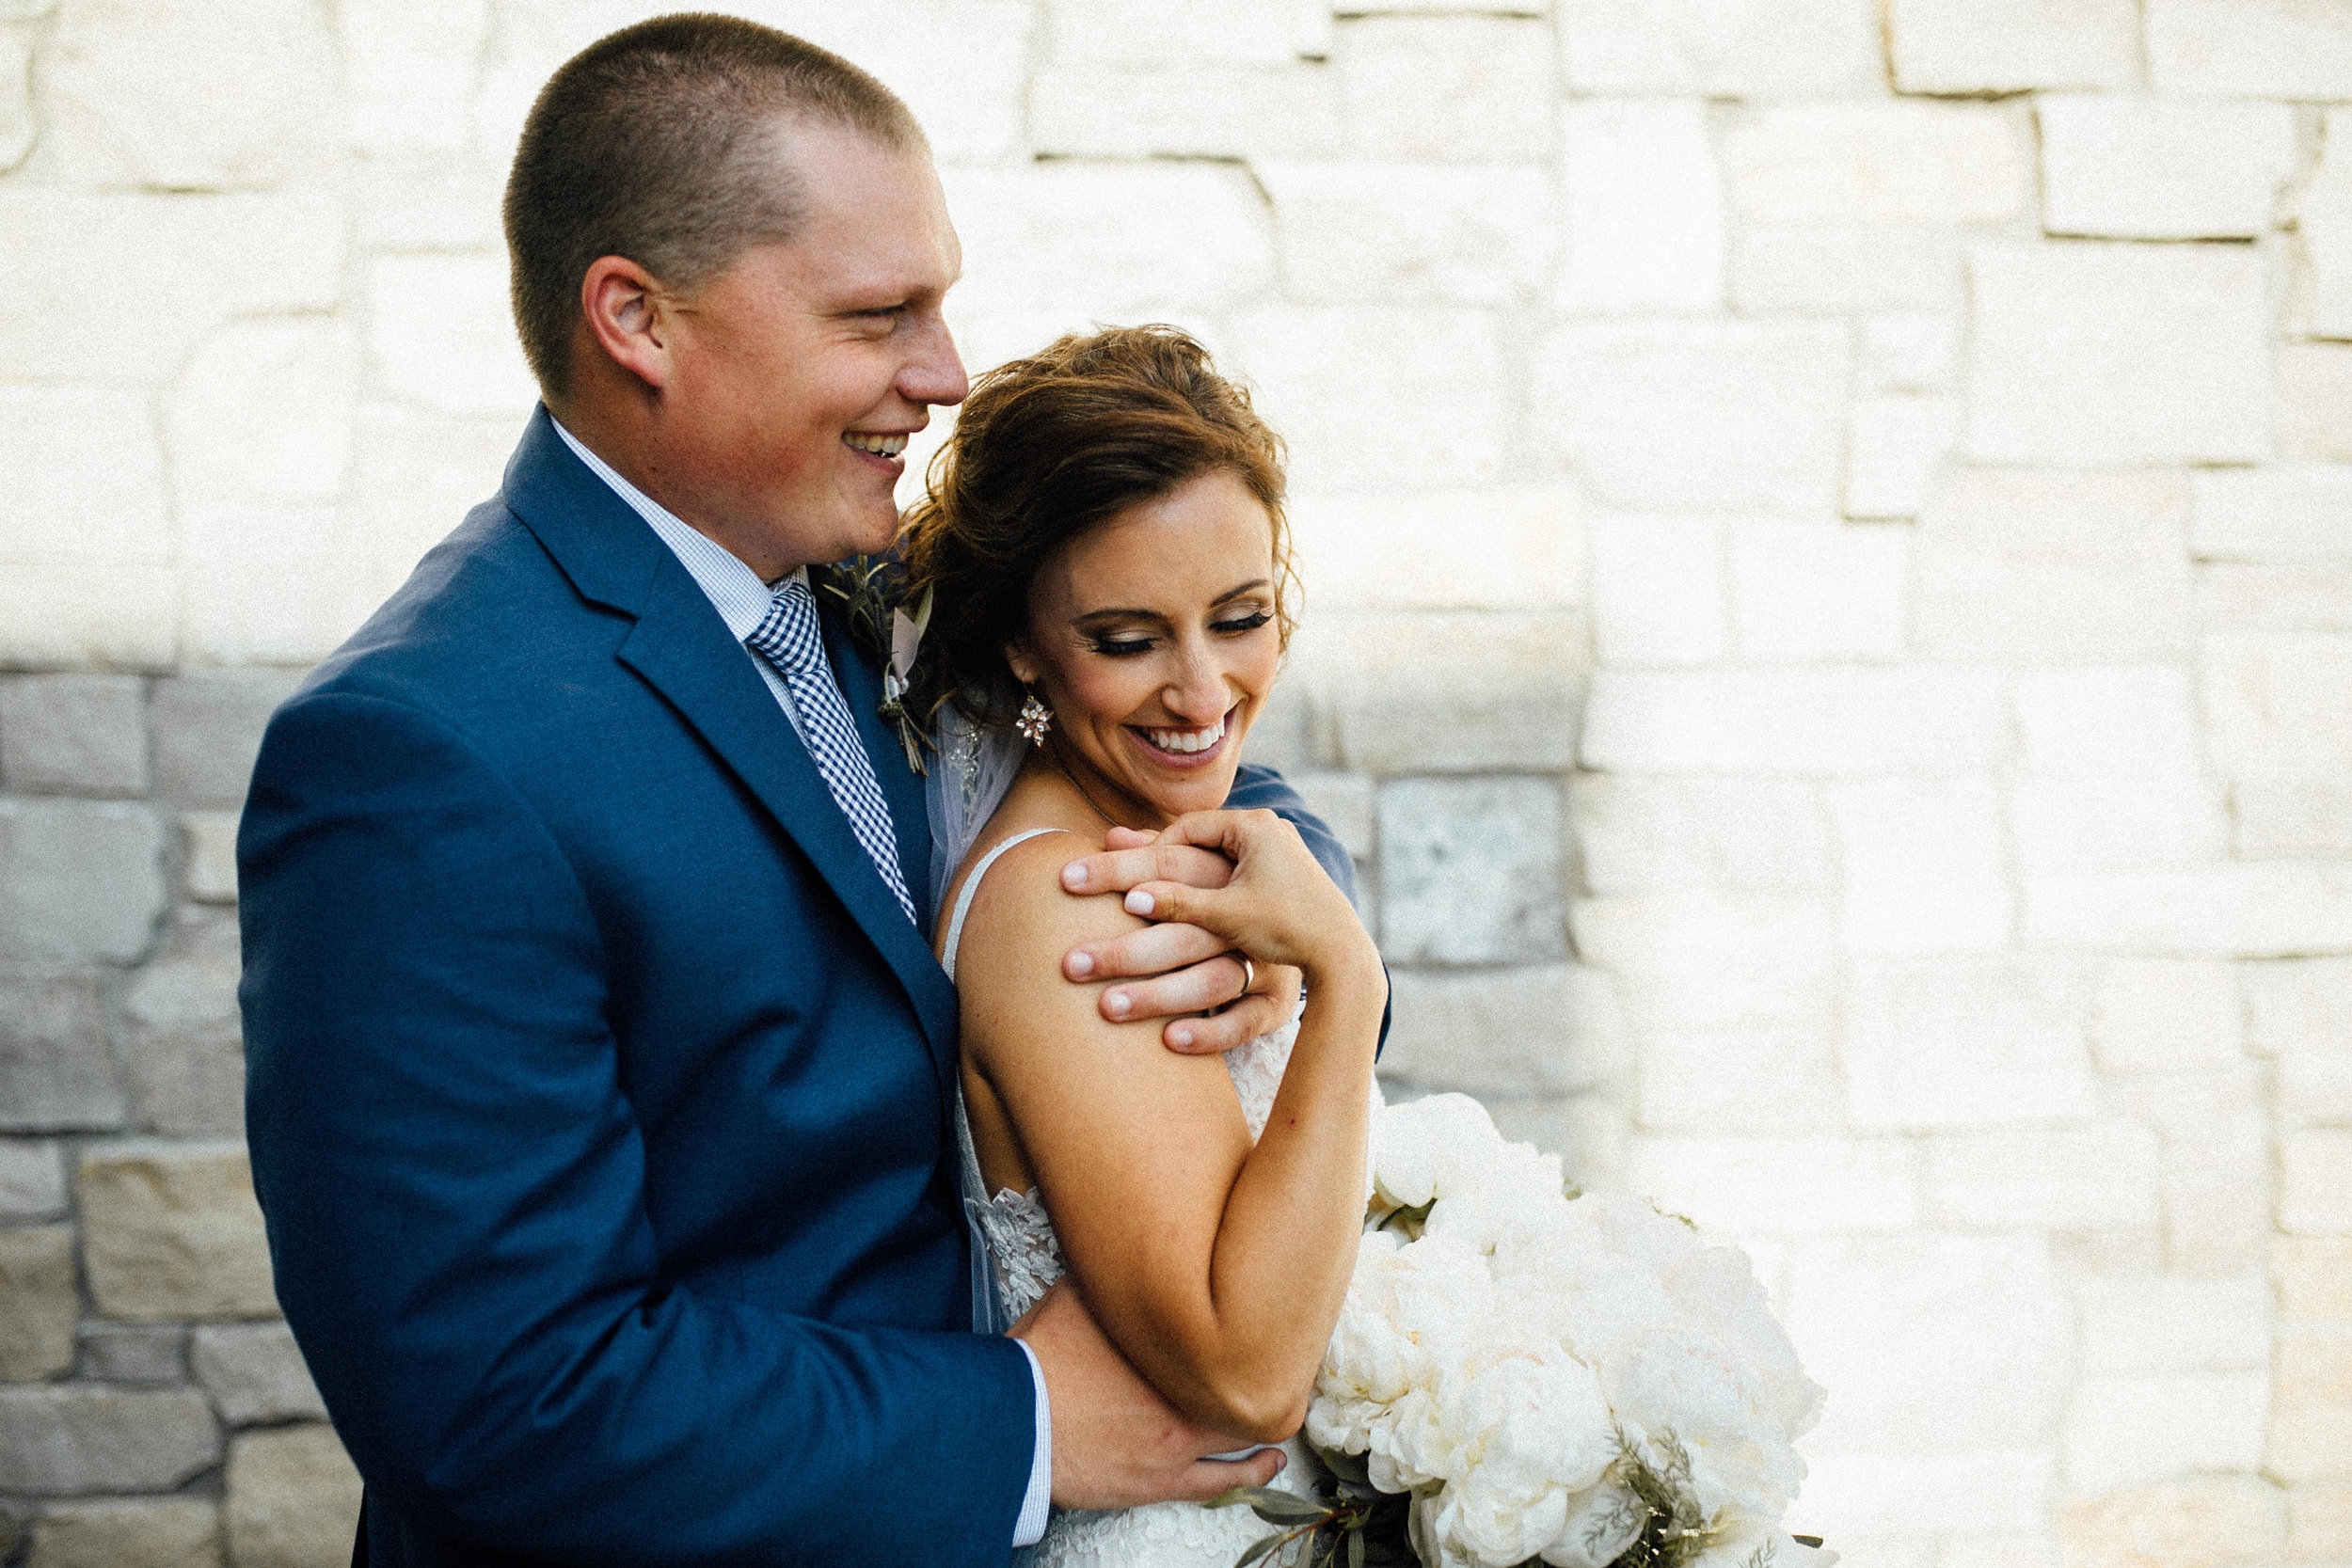 Whitney-Kevin-Portraits-Michigan-Wedding-Photographer-316.jpg